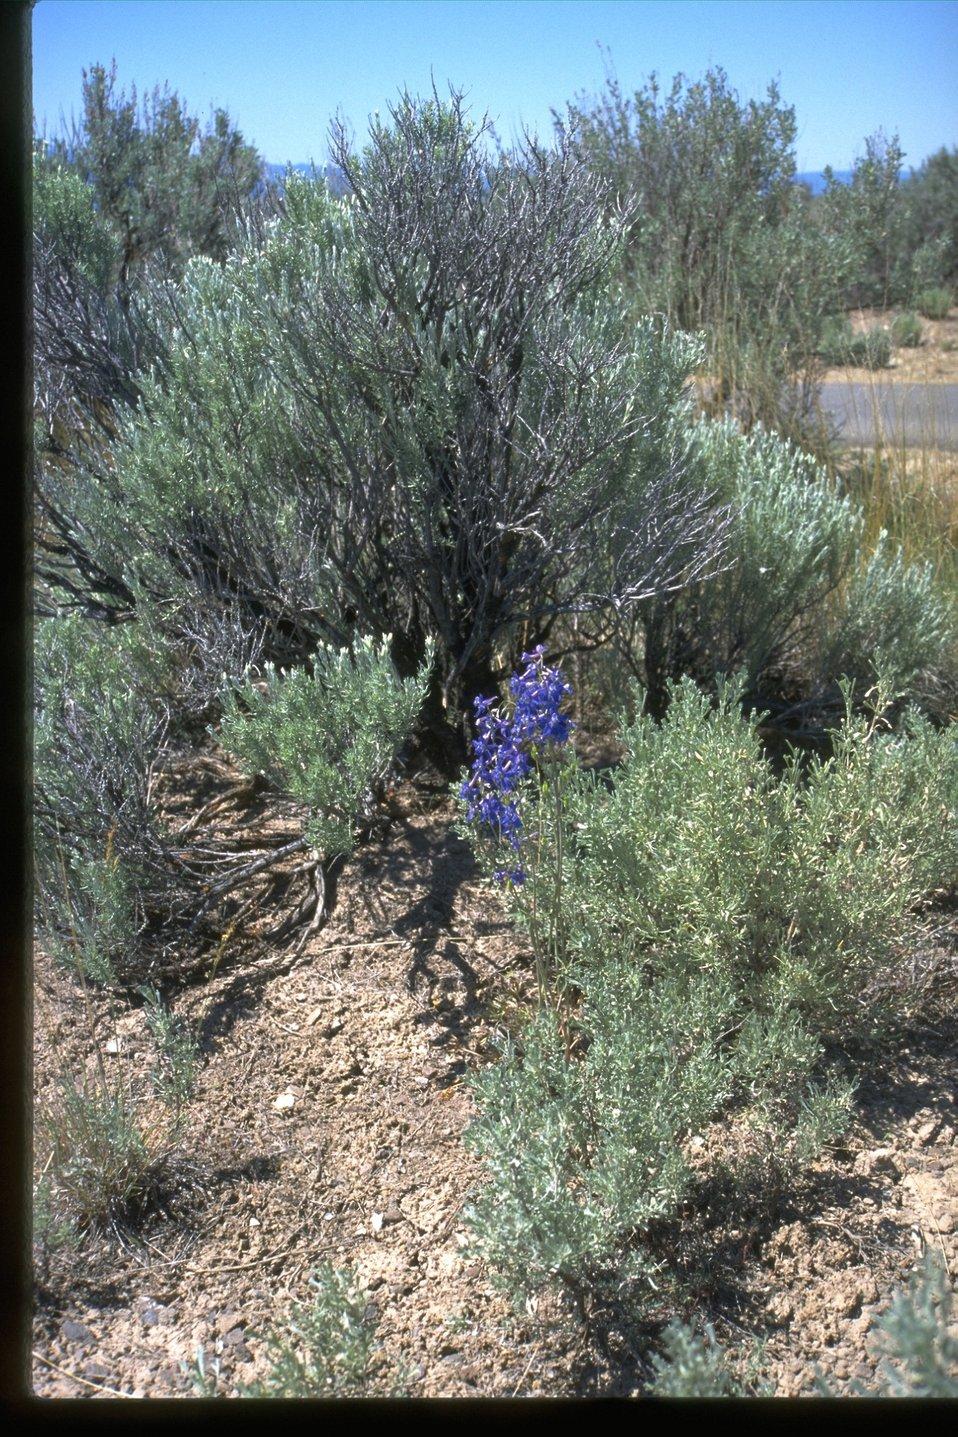 Wildflowers on Flagstaff Hill, near the NHOTIC.